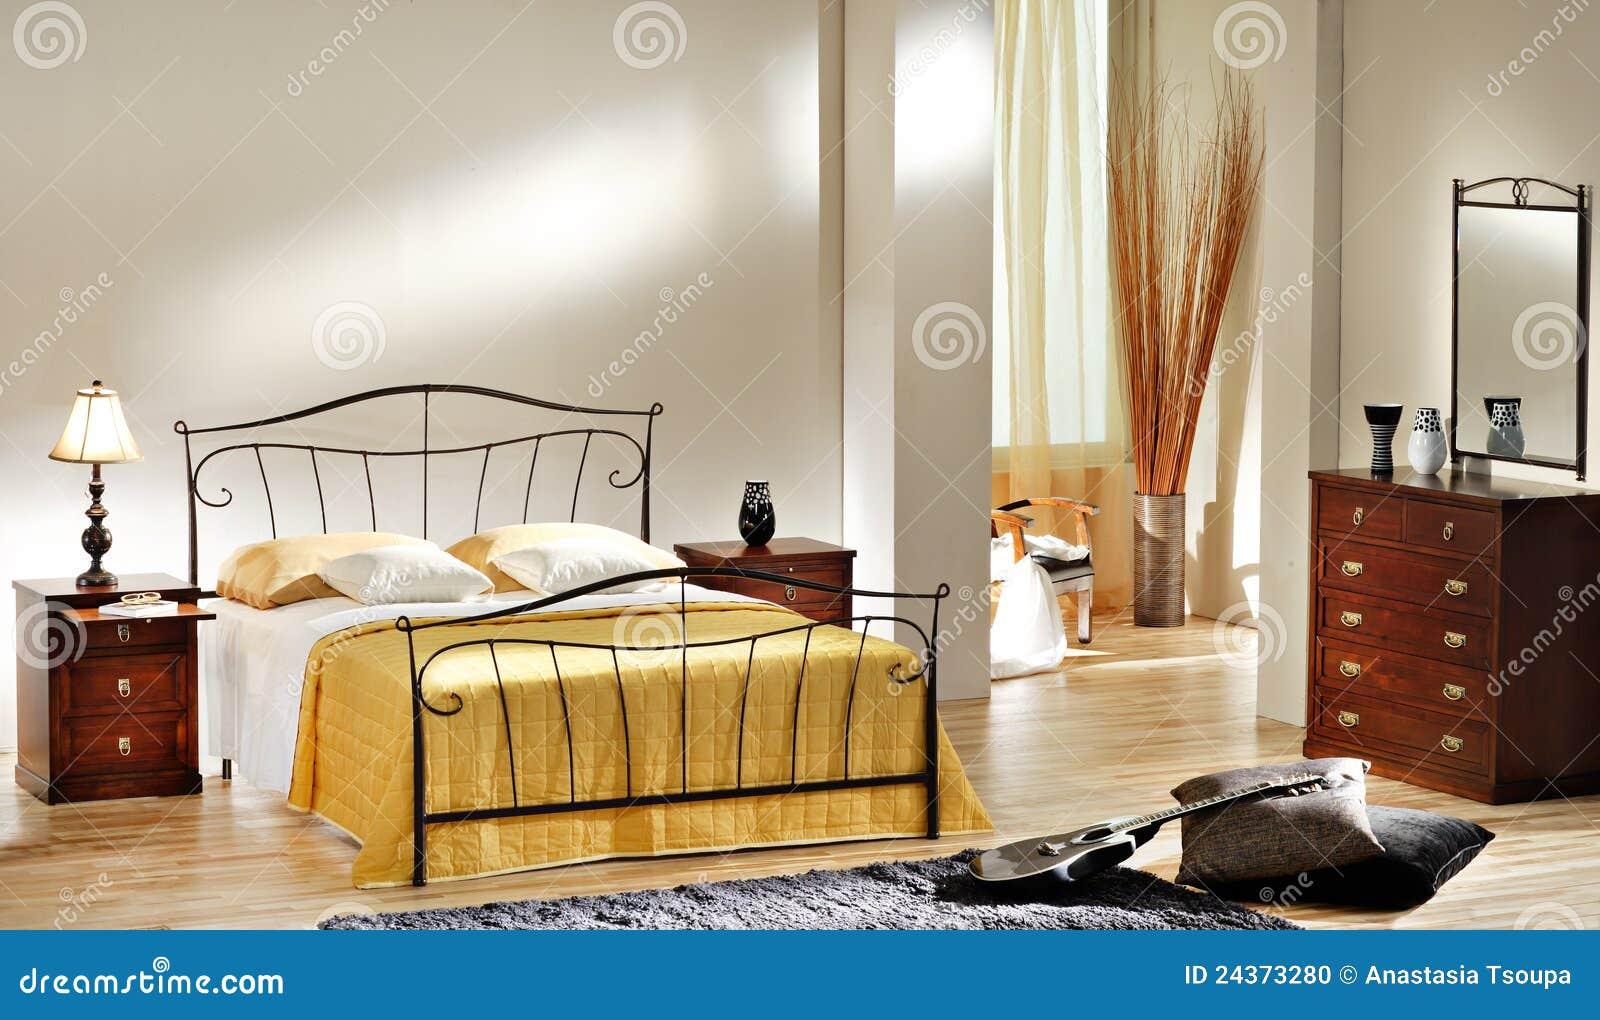 Klassiskt sovrum arkivfoto   bild: 24373280